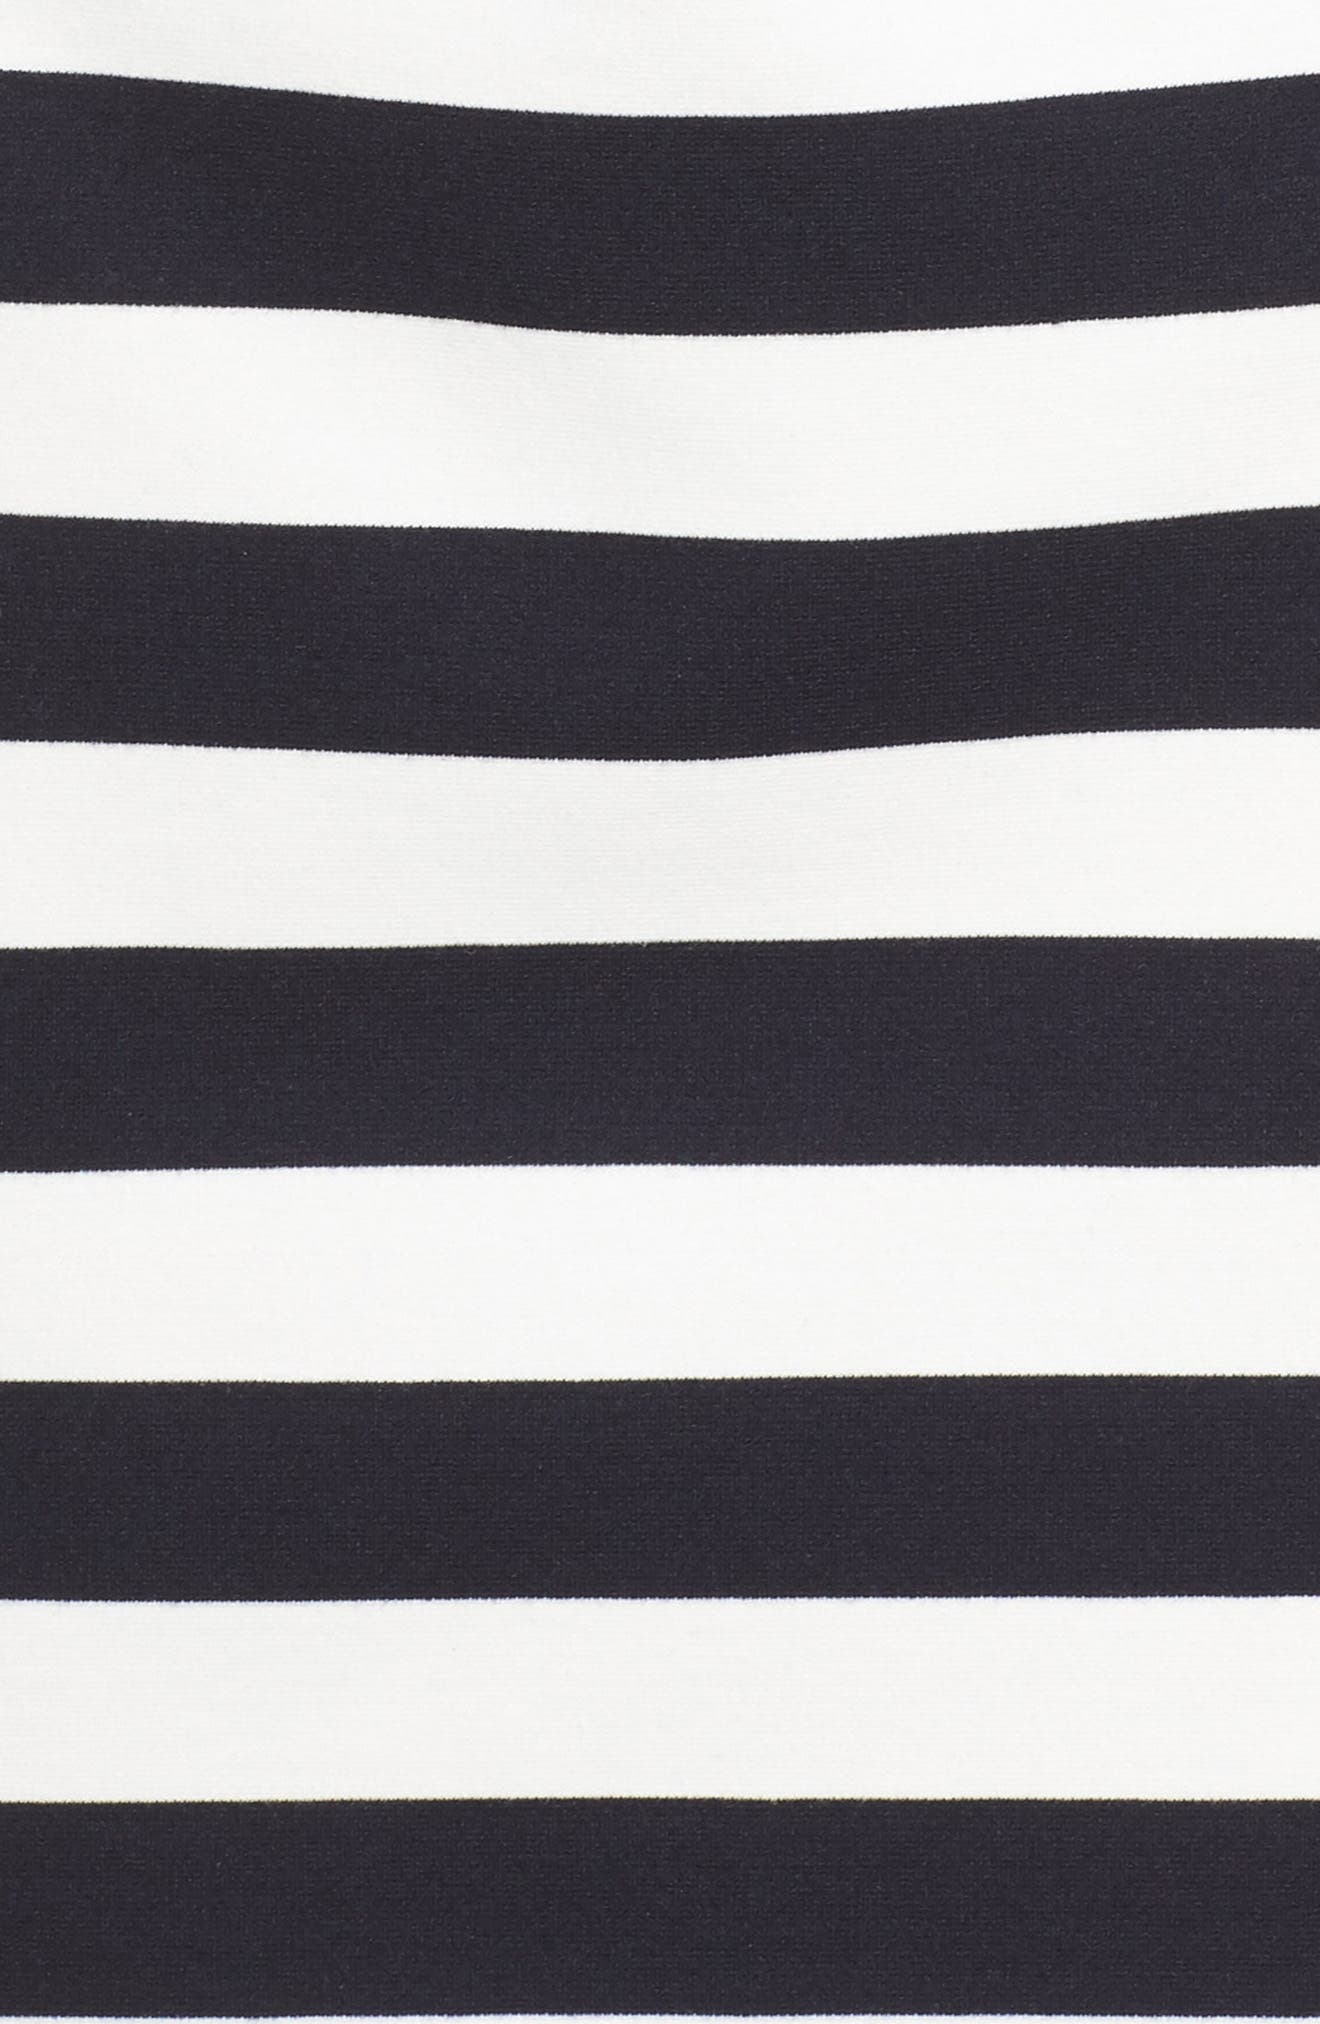 Stripe Ruffle Sheath Dress,                             Alternate thumbnail 5, color,                             Navy/ Ivory